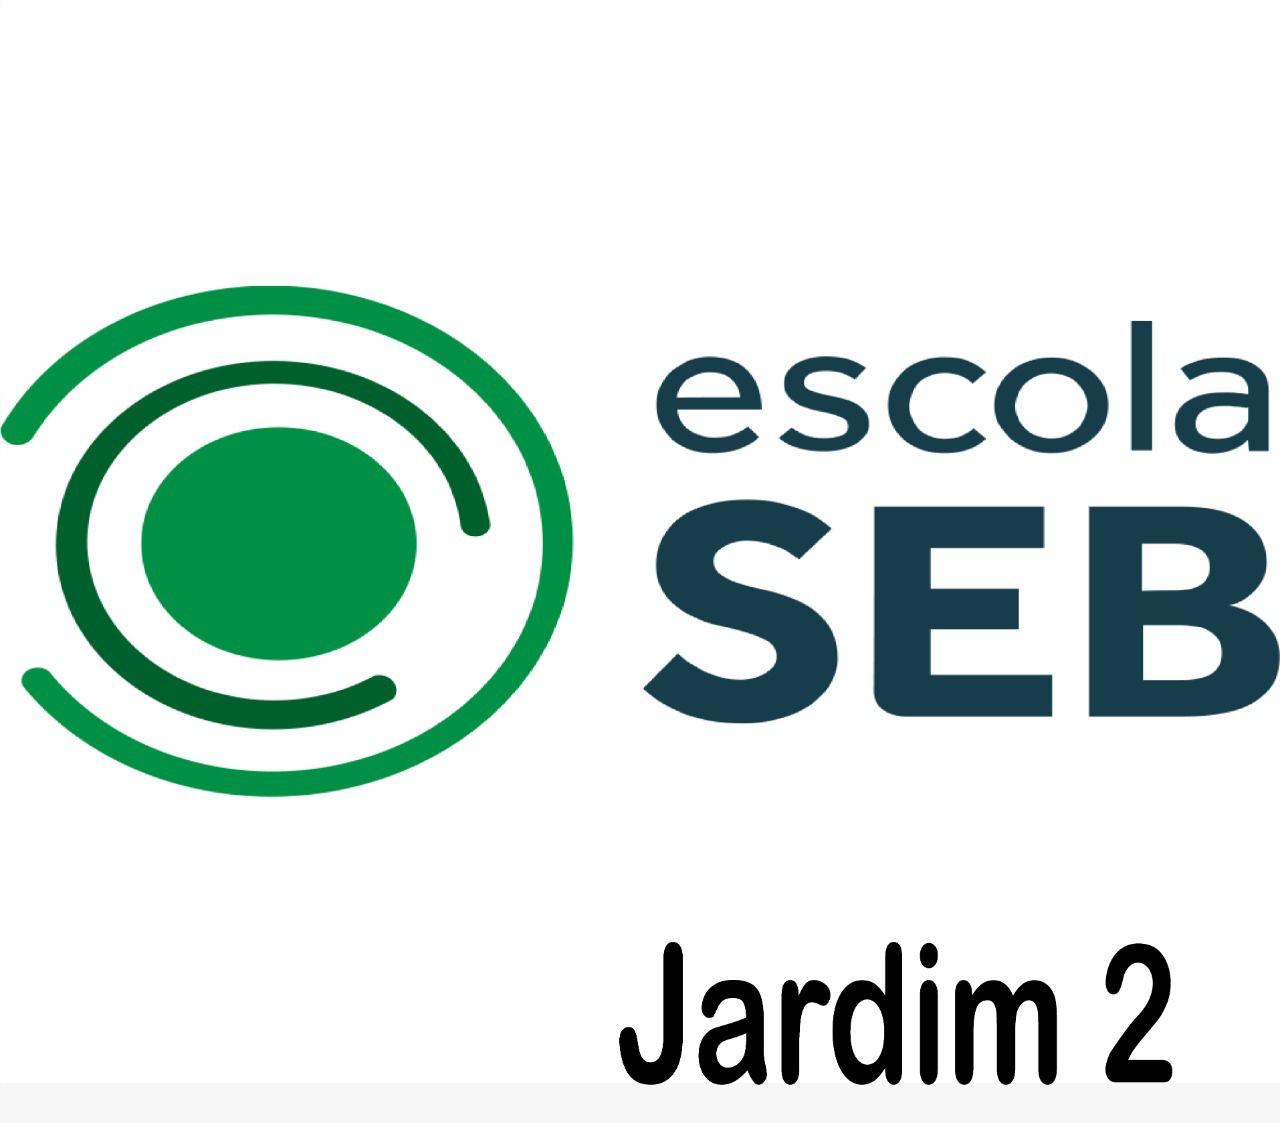 Seb Coc - Jardim 2 - 2021